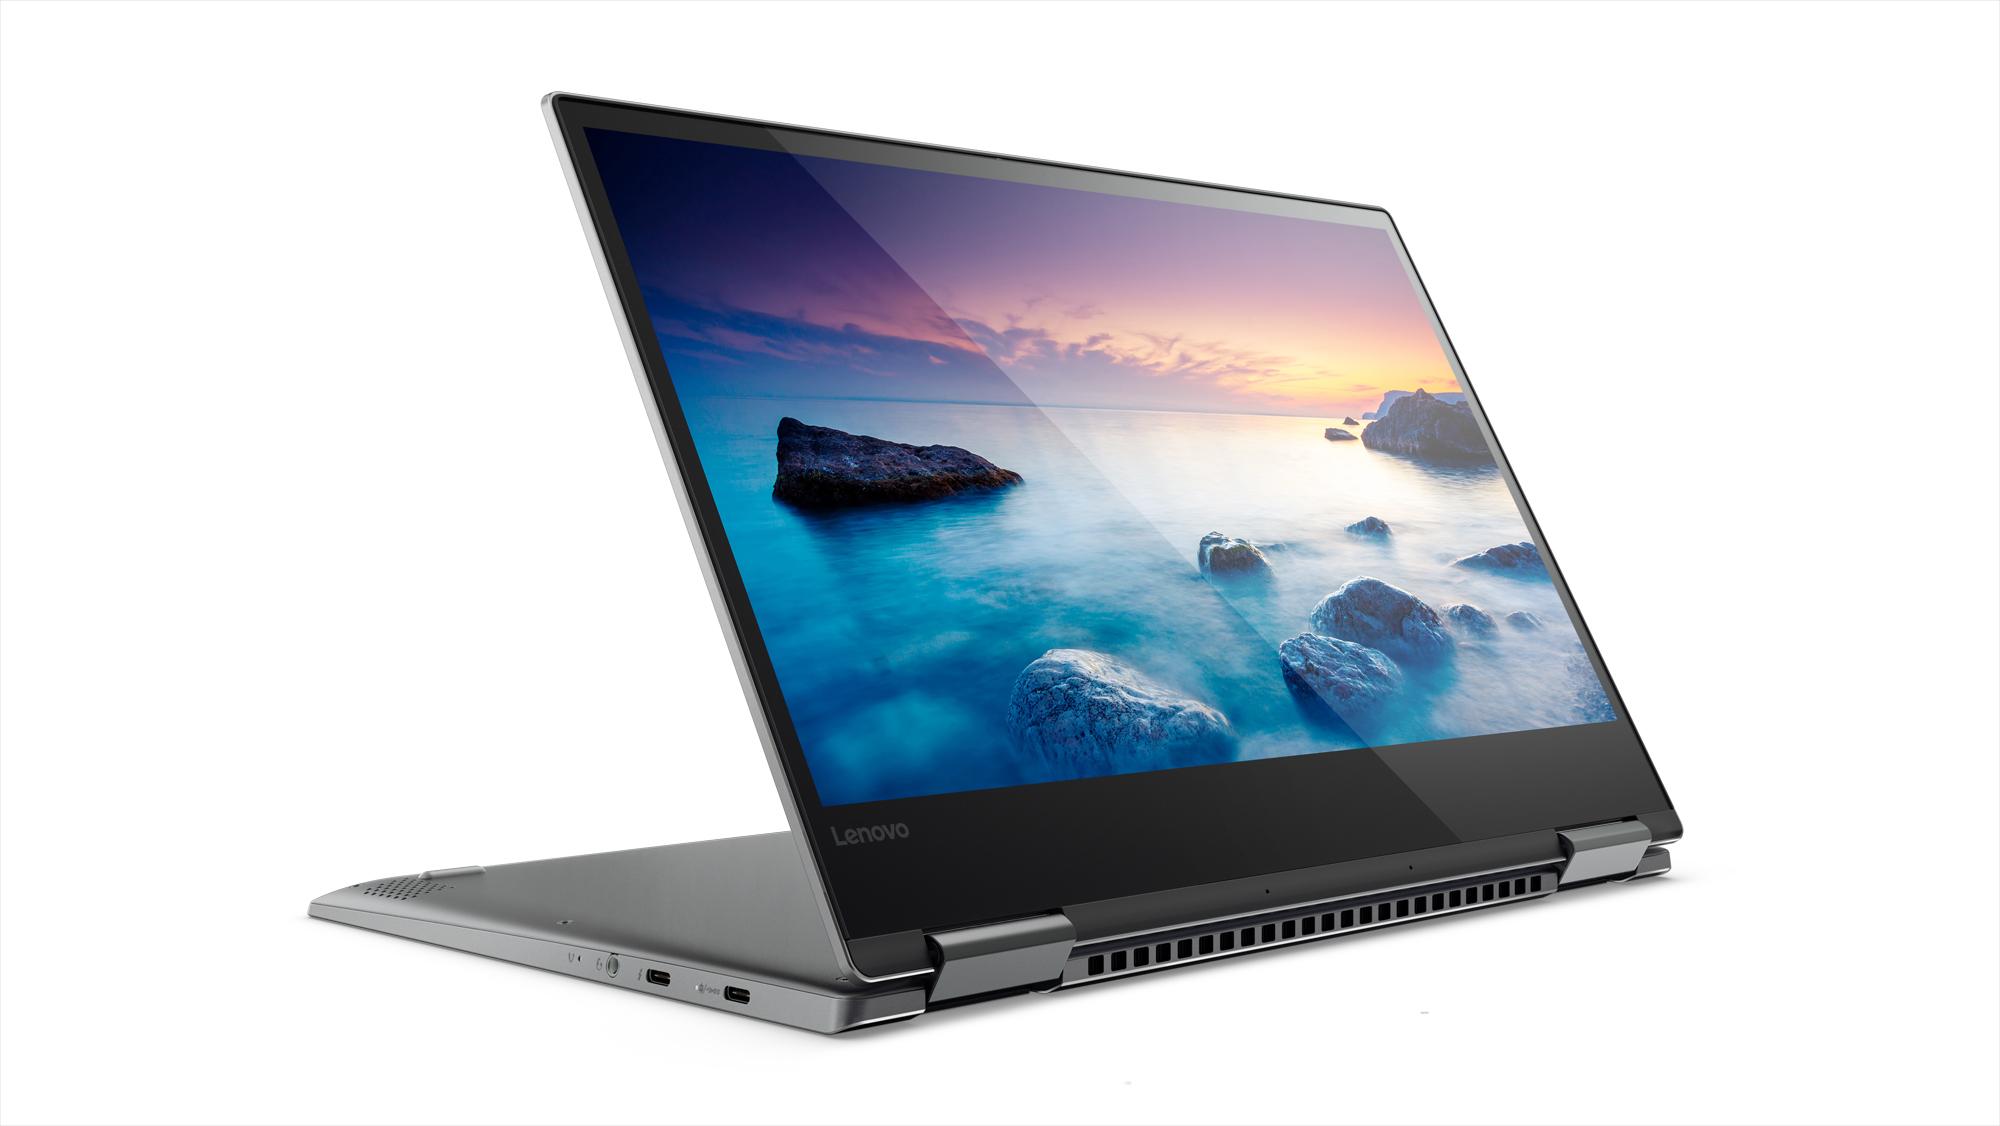 Фото  Ультрабук Lenovo Yoga 720 Iron Grey (81C300A1RA)